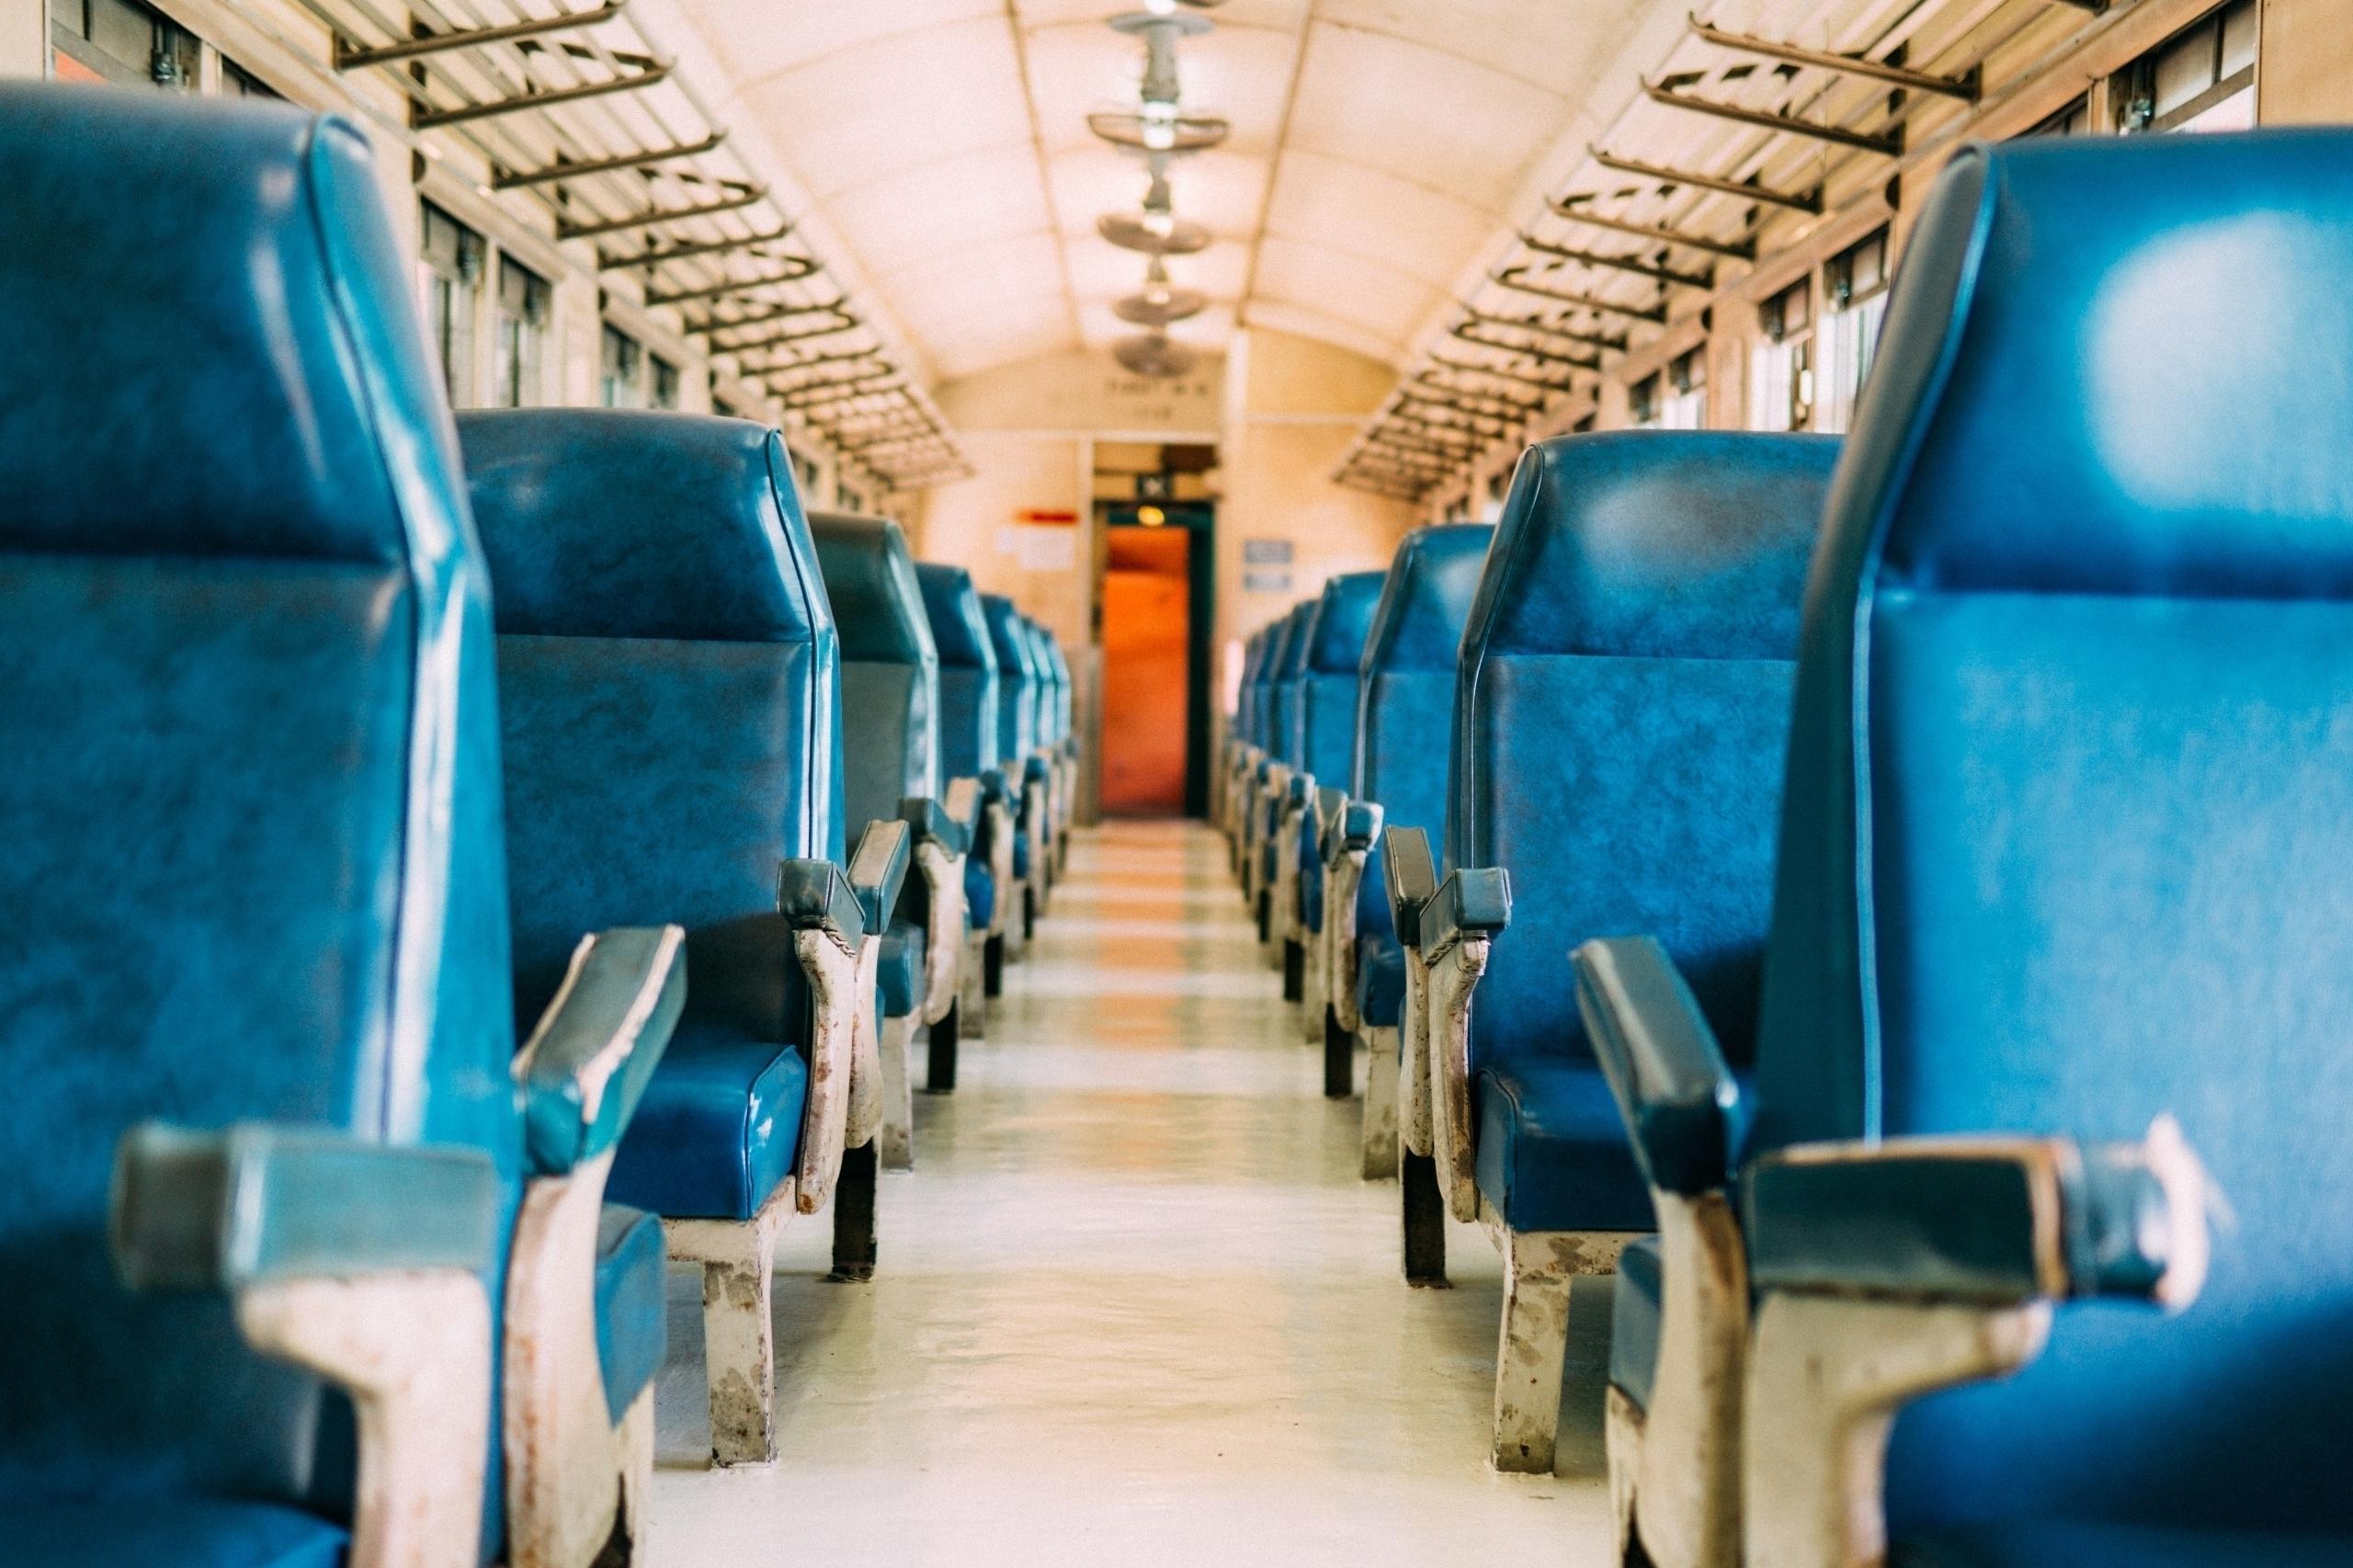 HK railway museum - train - maxchiu0714 | ello